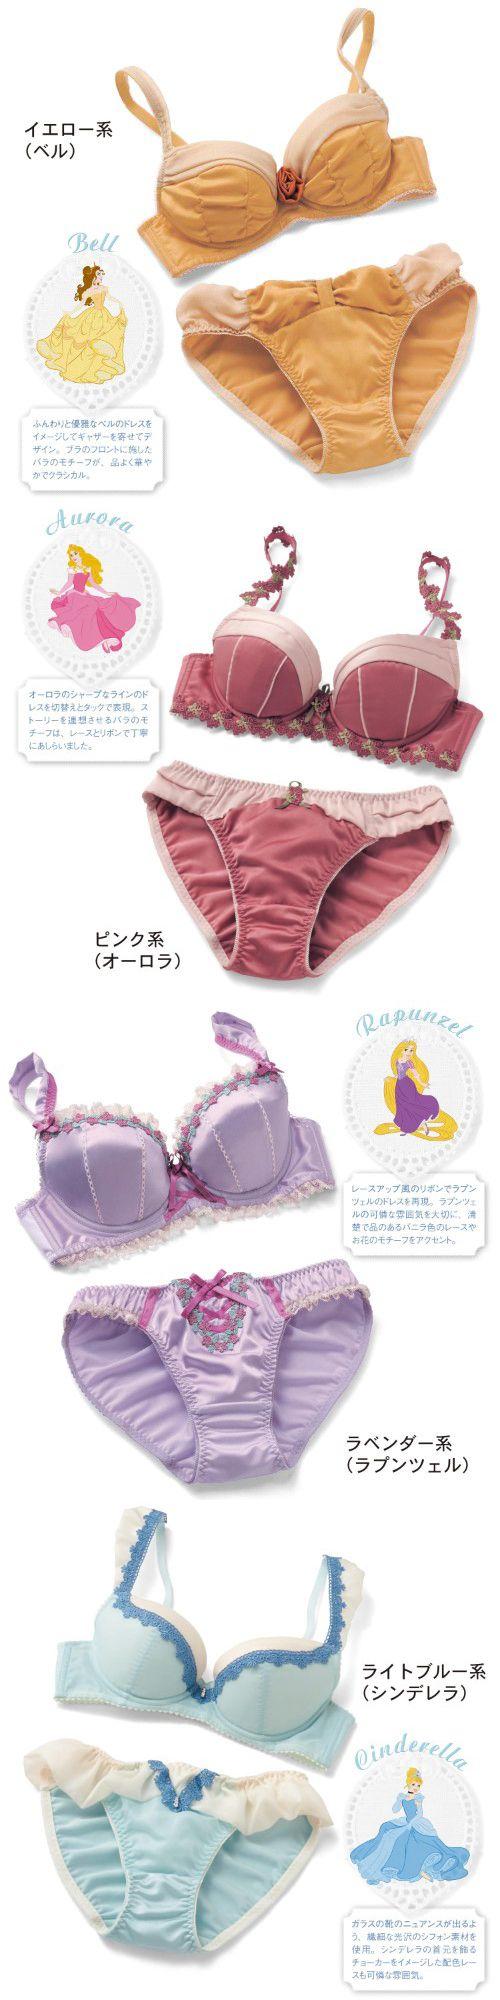 Would You Wear Disney Princess Lingerie?